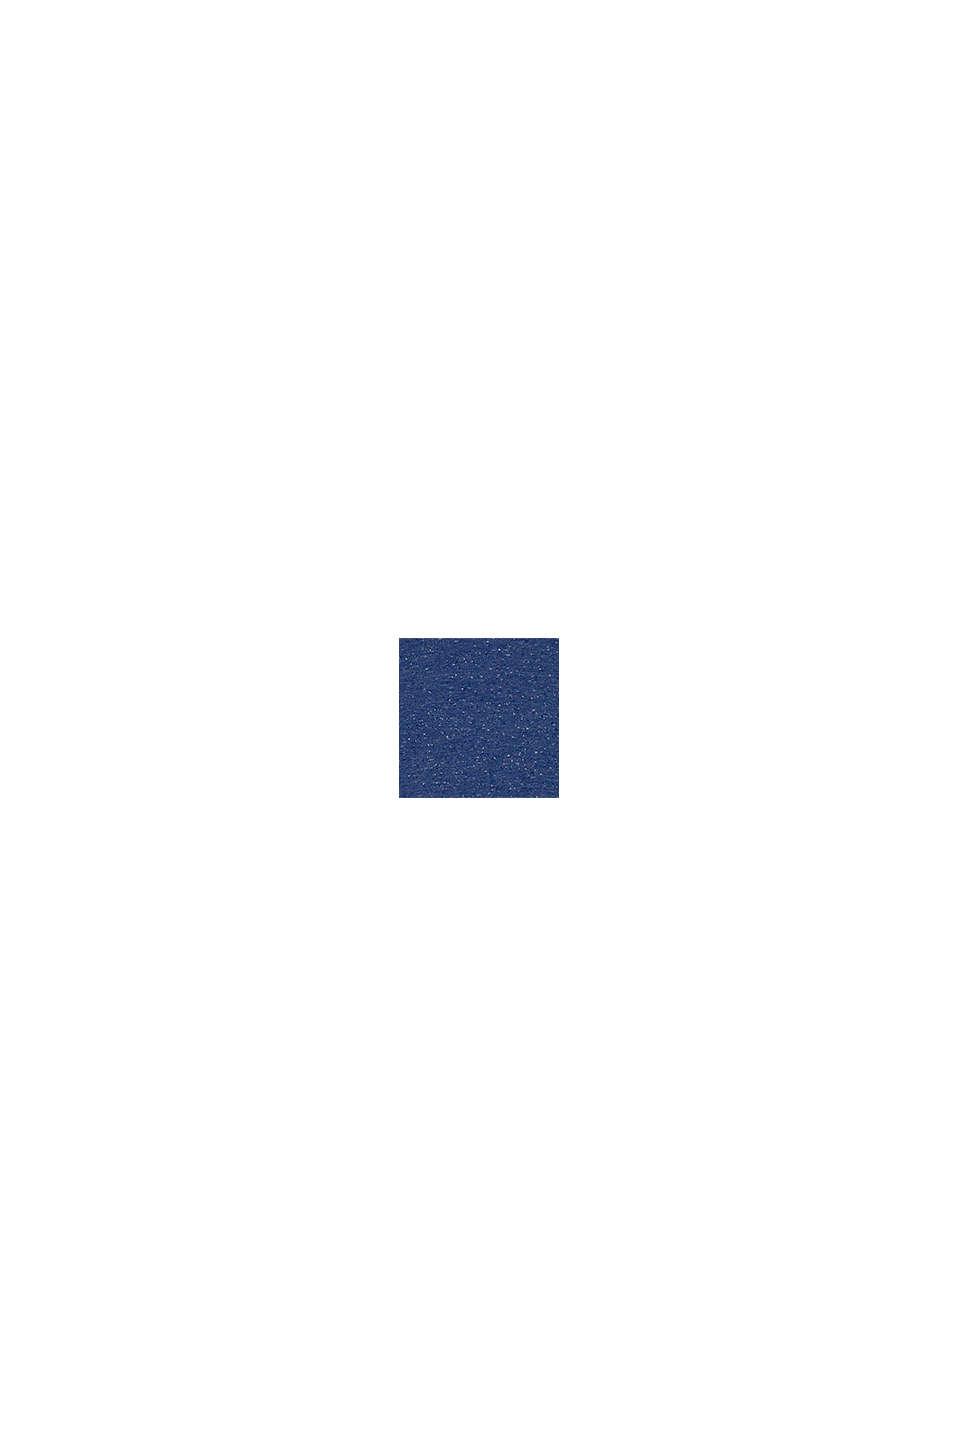 T-shirt med dubbelkrage i bomull, BLUE, swatch